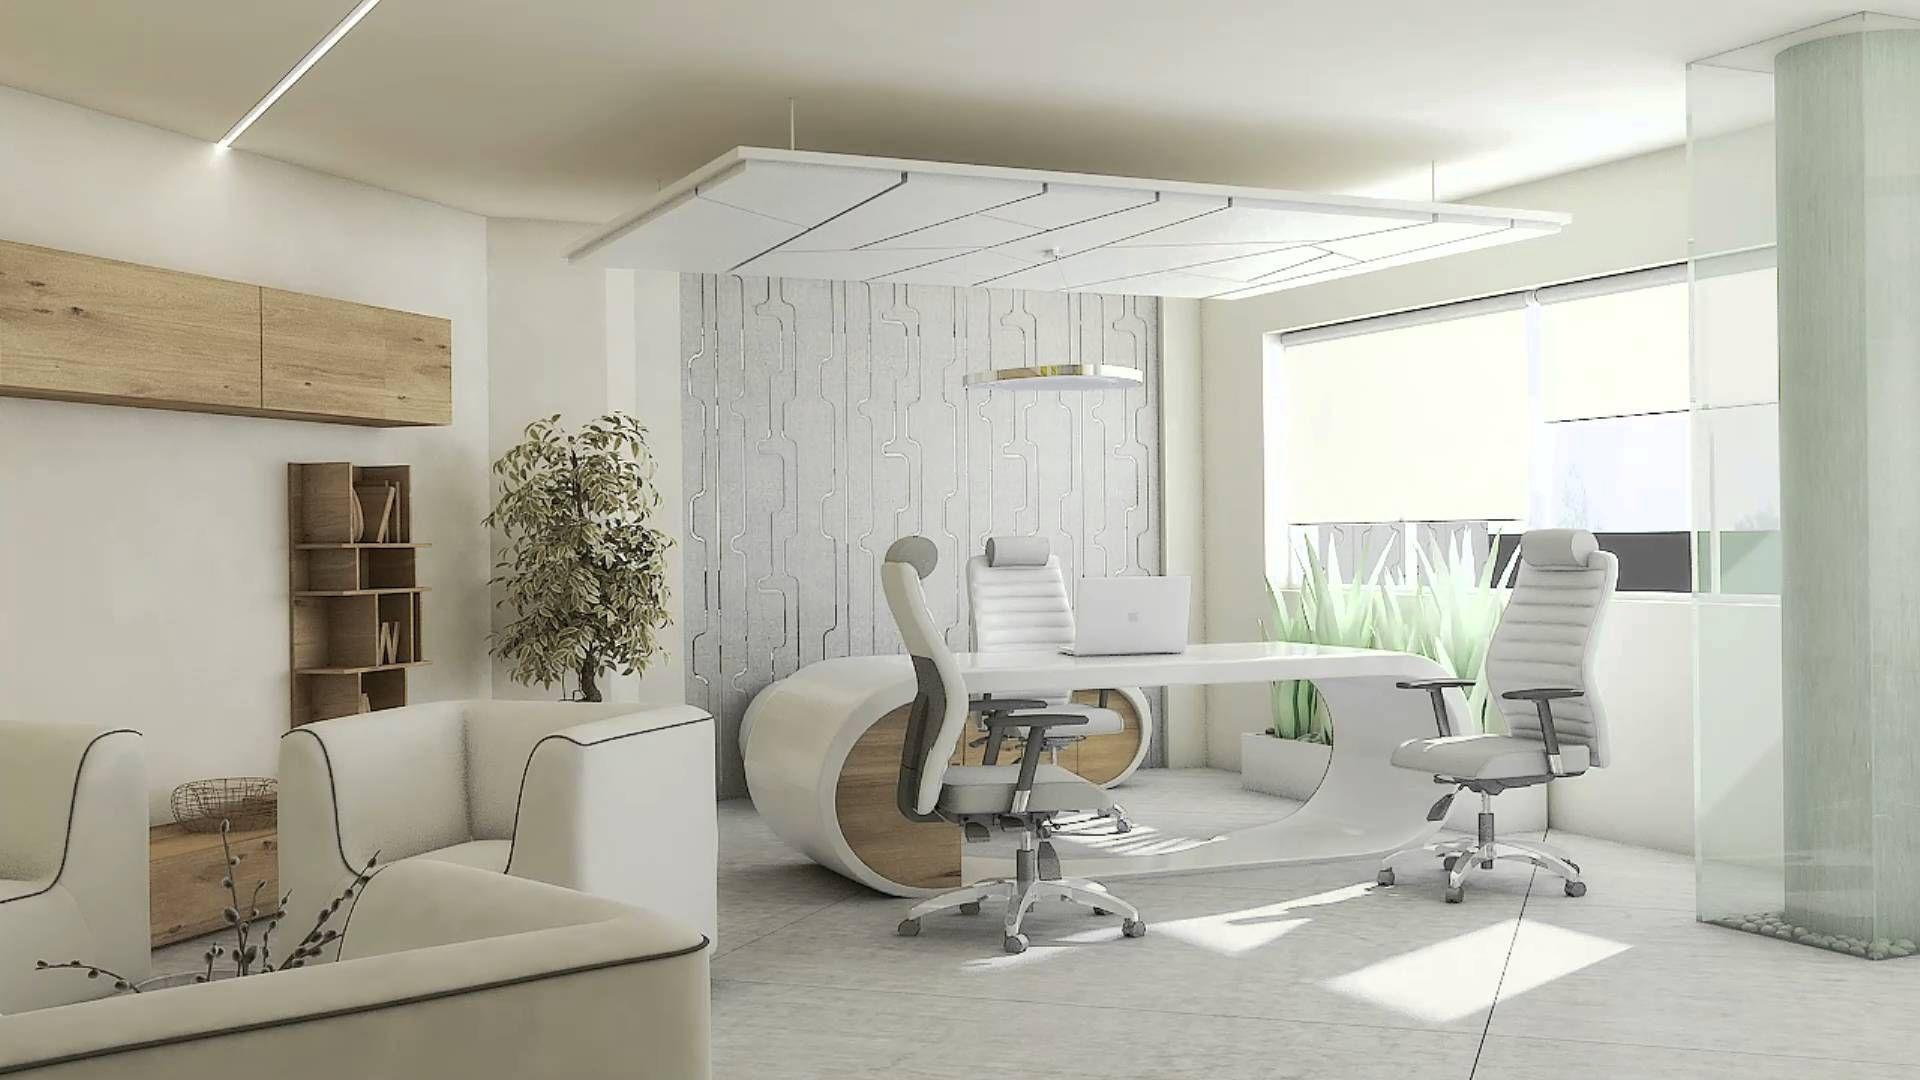 Ceo Office Design Ceo Office Executive Office Design Office Design